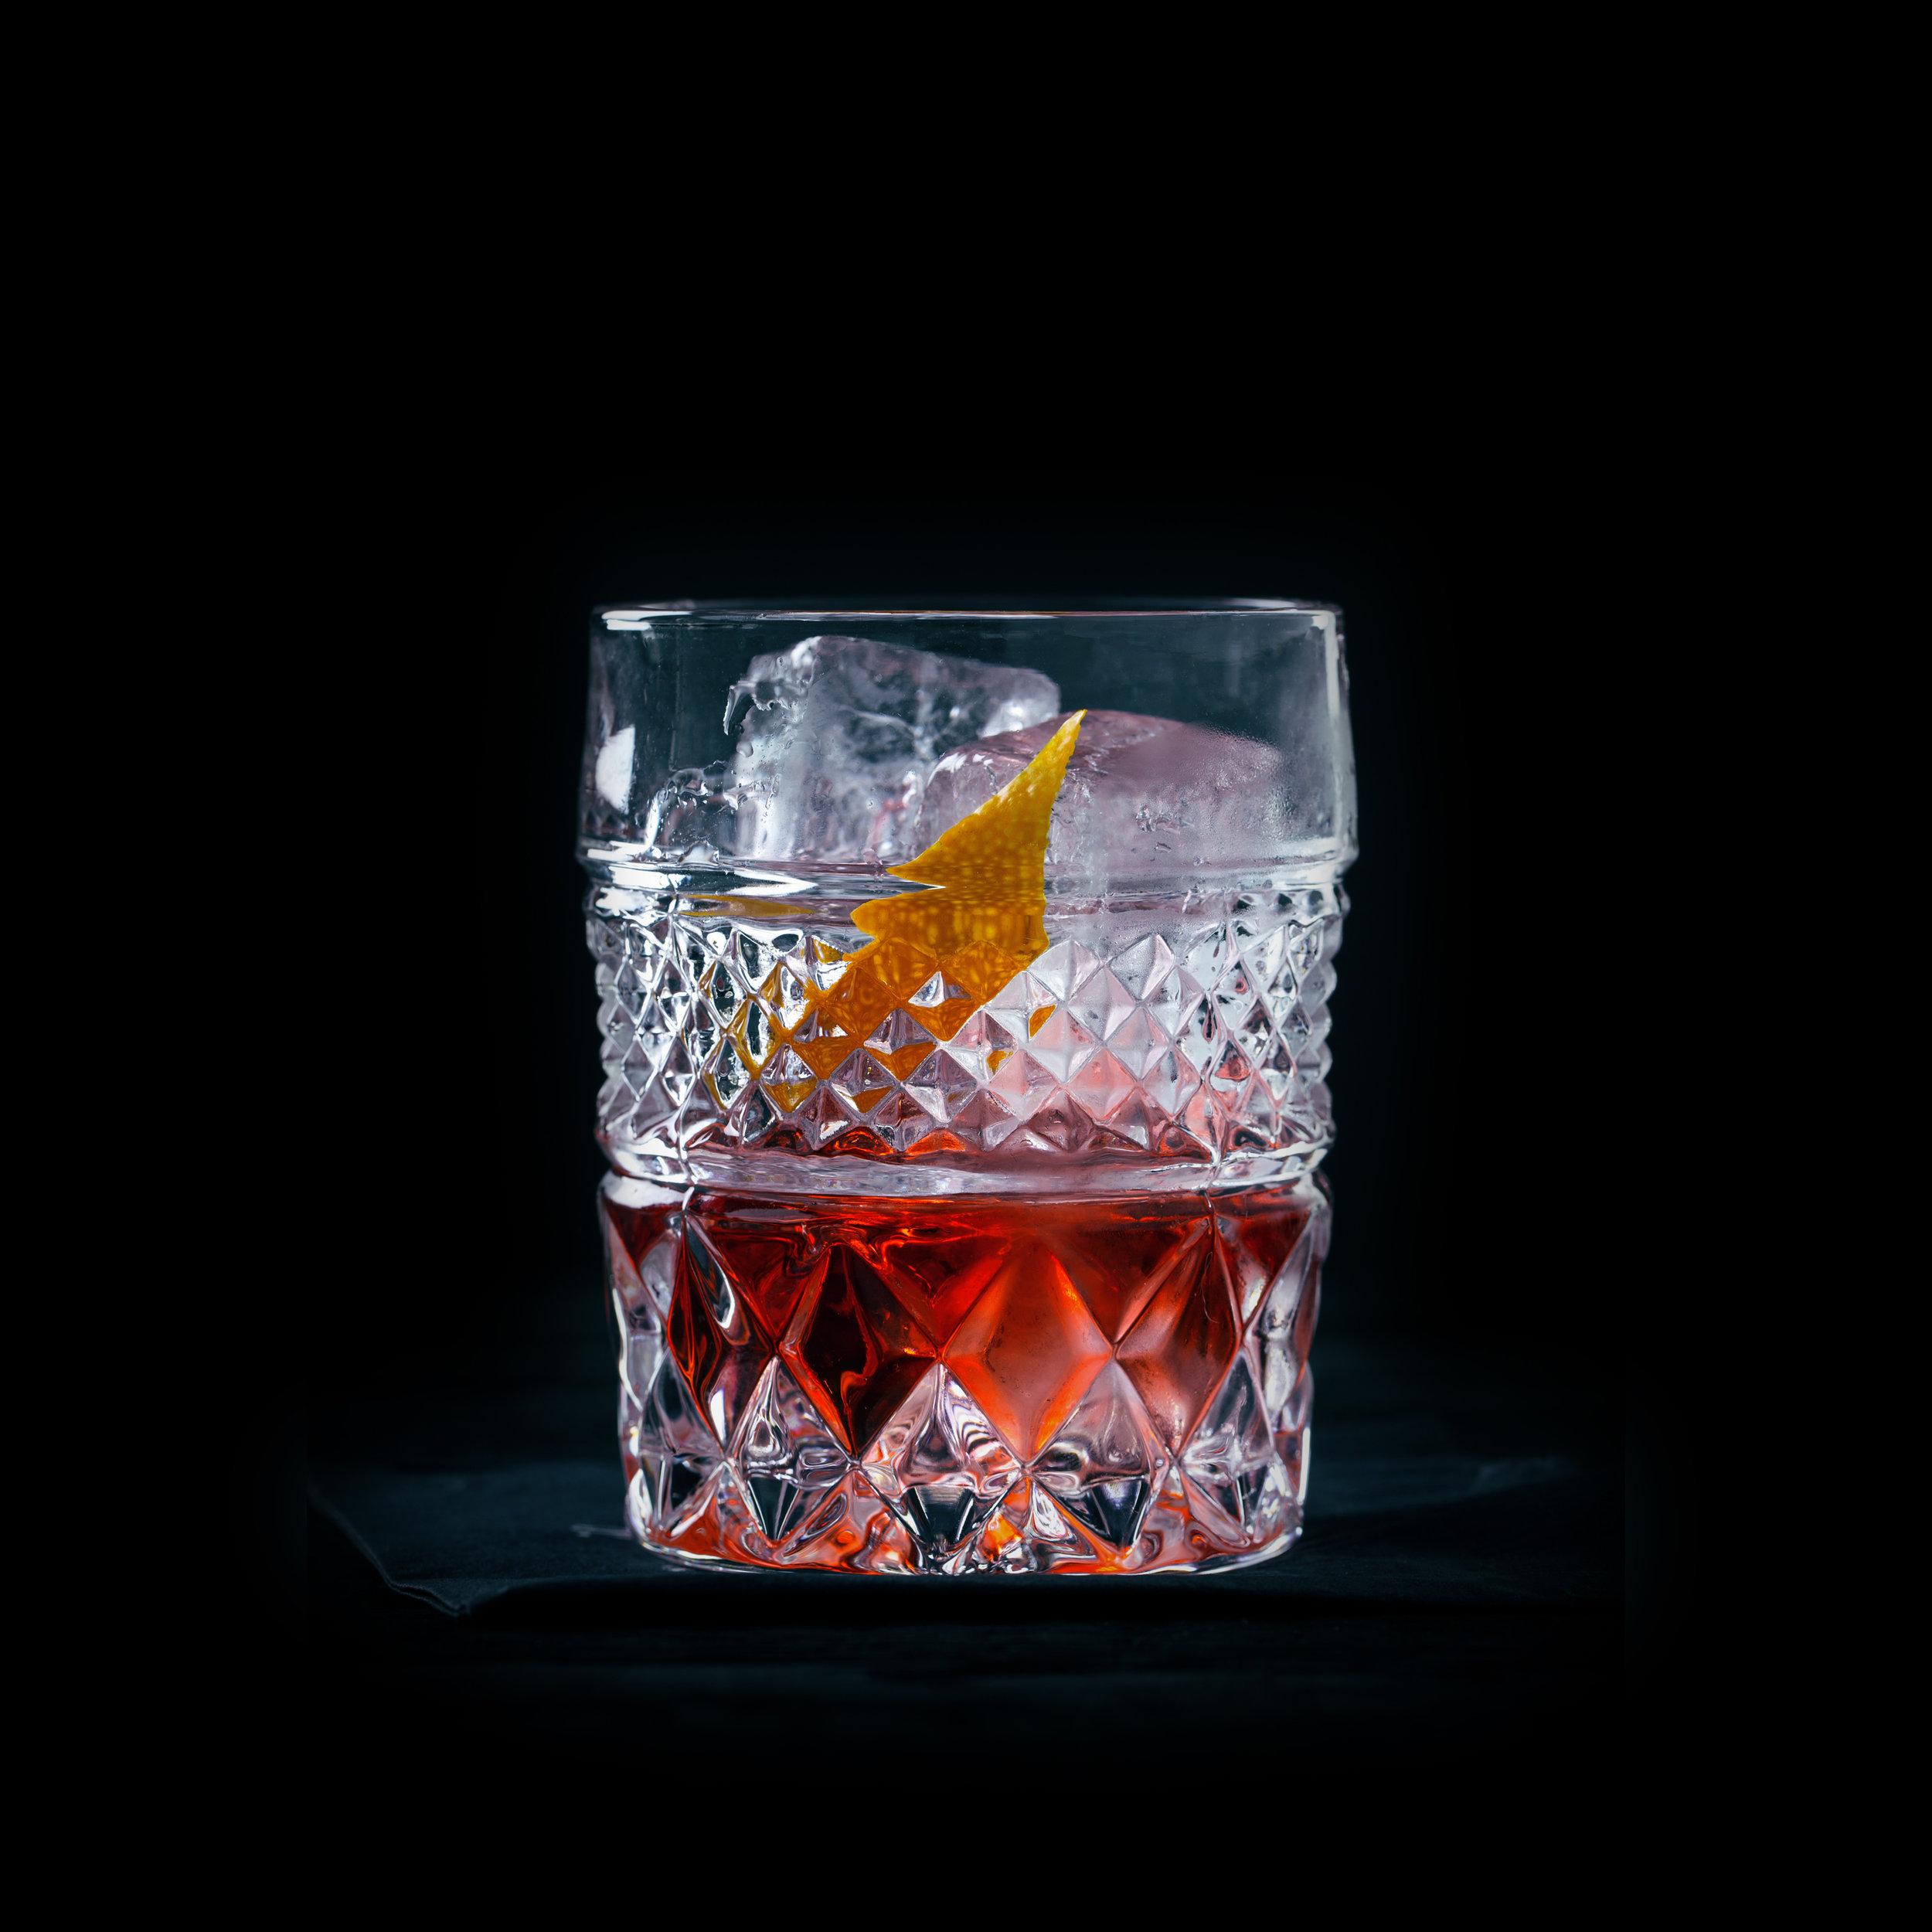 MEZCAL NEGRONI  INGREDIENTS  - 1 oz. El Silencio Espadin - 1 oz. Carpano Antica Formula Vermouth - 1 oz. Campari  METHOD  Stir with ice & Strain Rocks Glass - Orange Peel